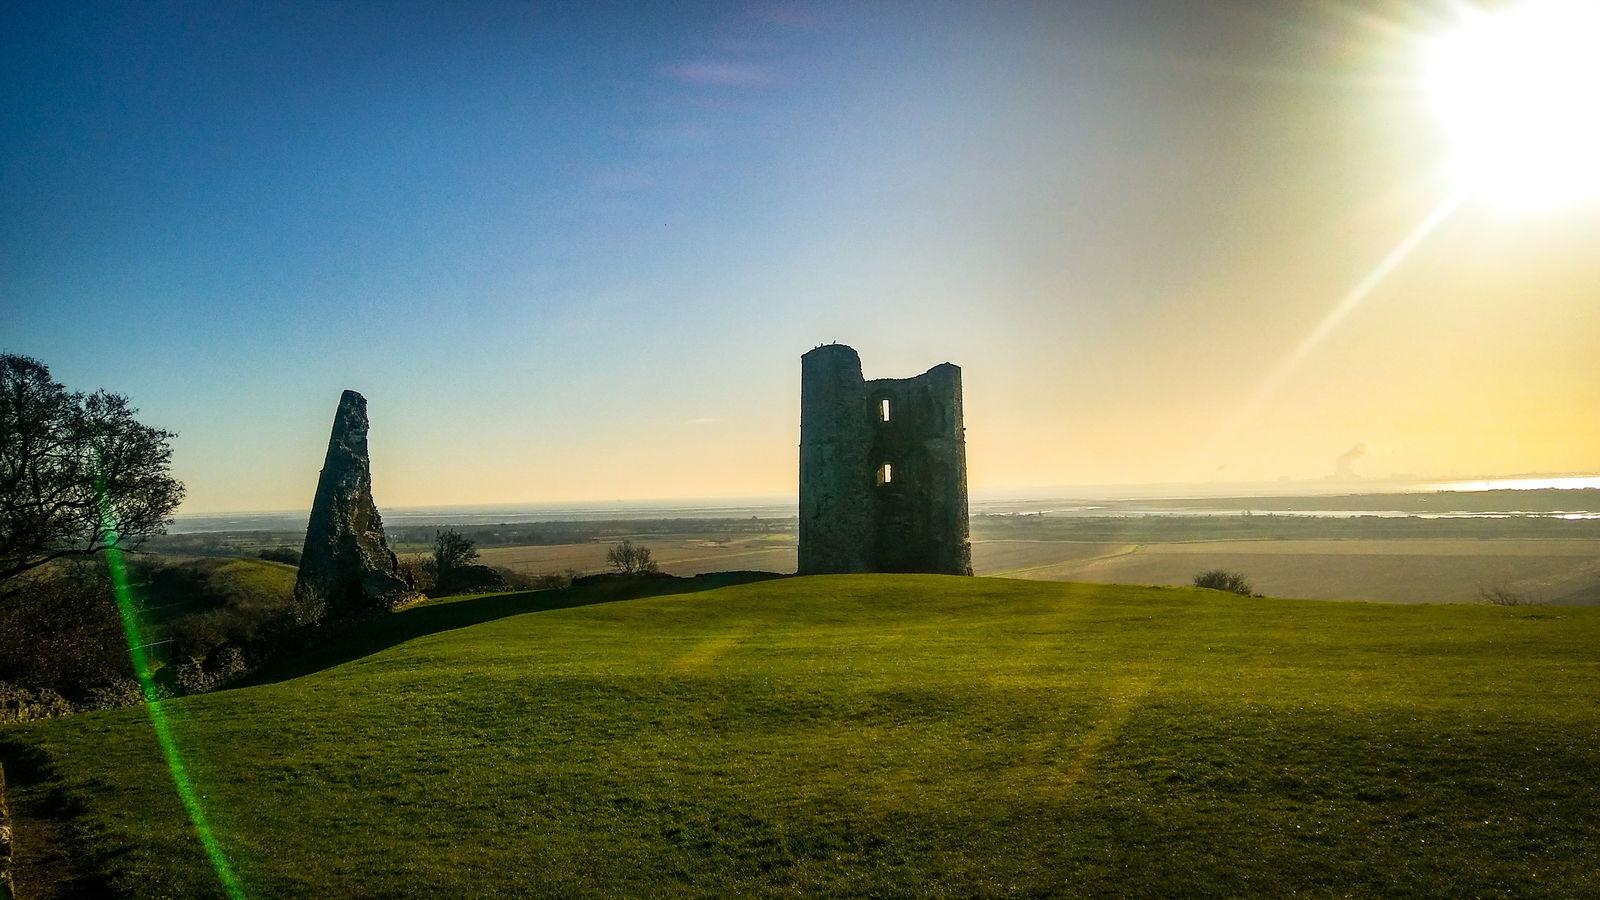 Sunlight Travel Destinations Grass Outdoors Castle Ruins Of A Castle